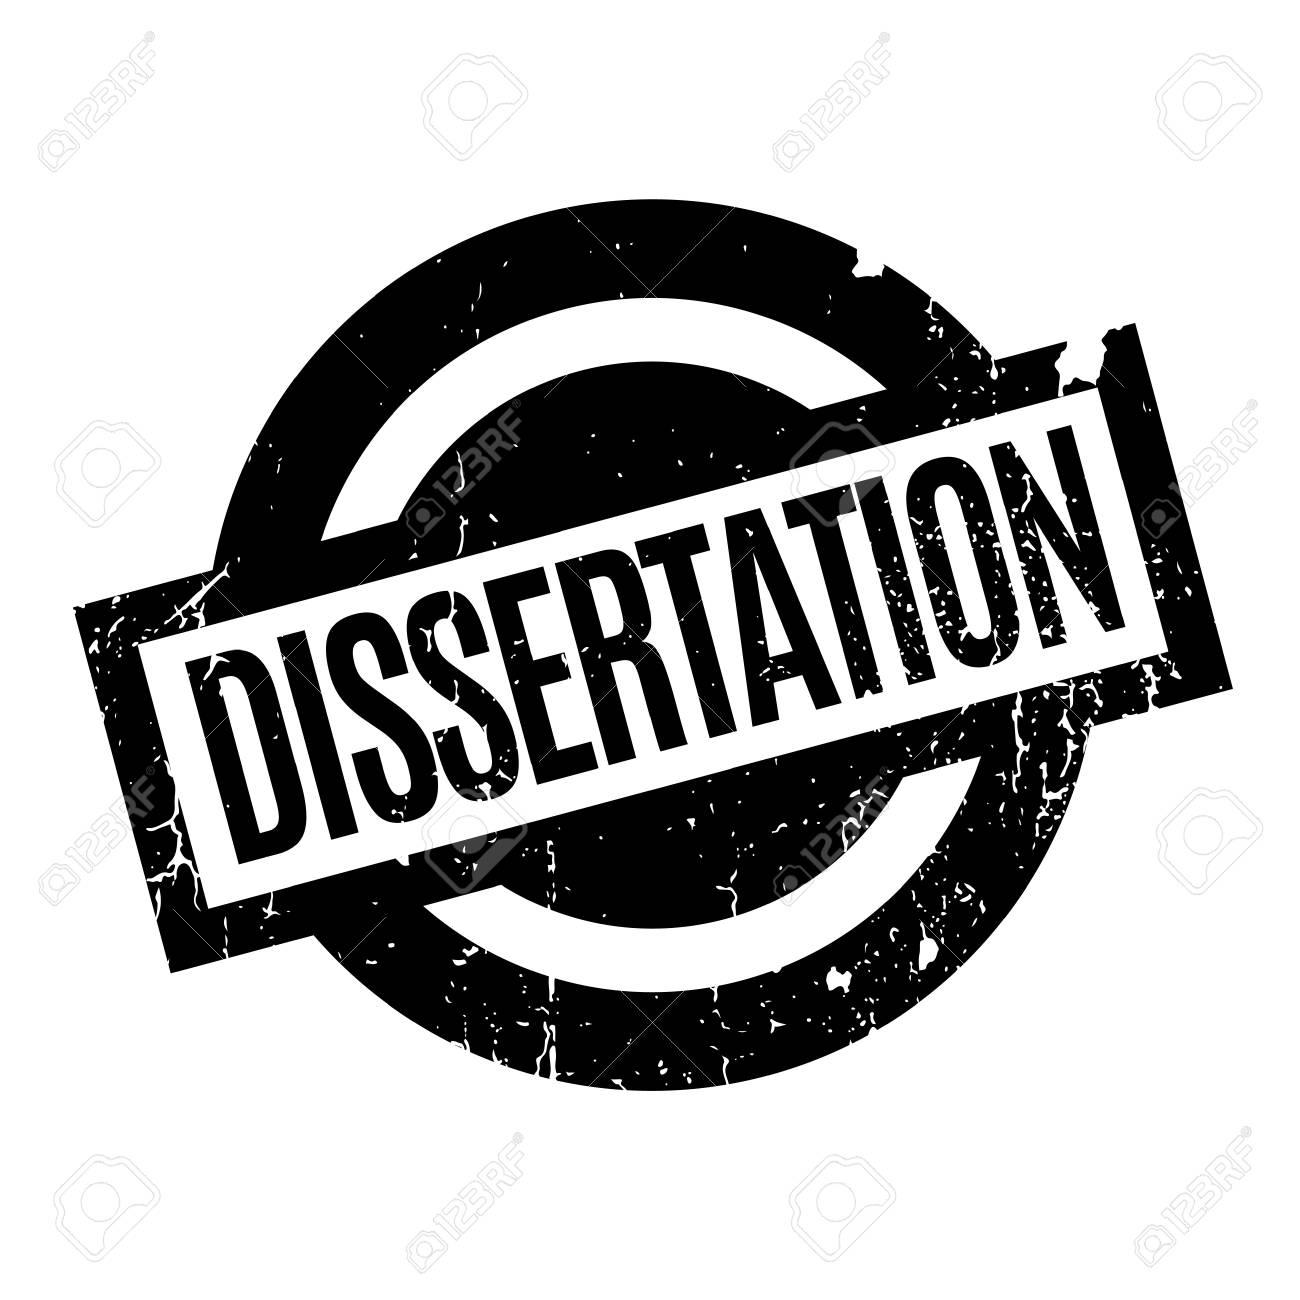 Illustration dissertation topics to write about argumentative essay